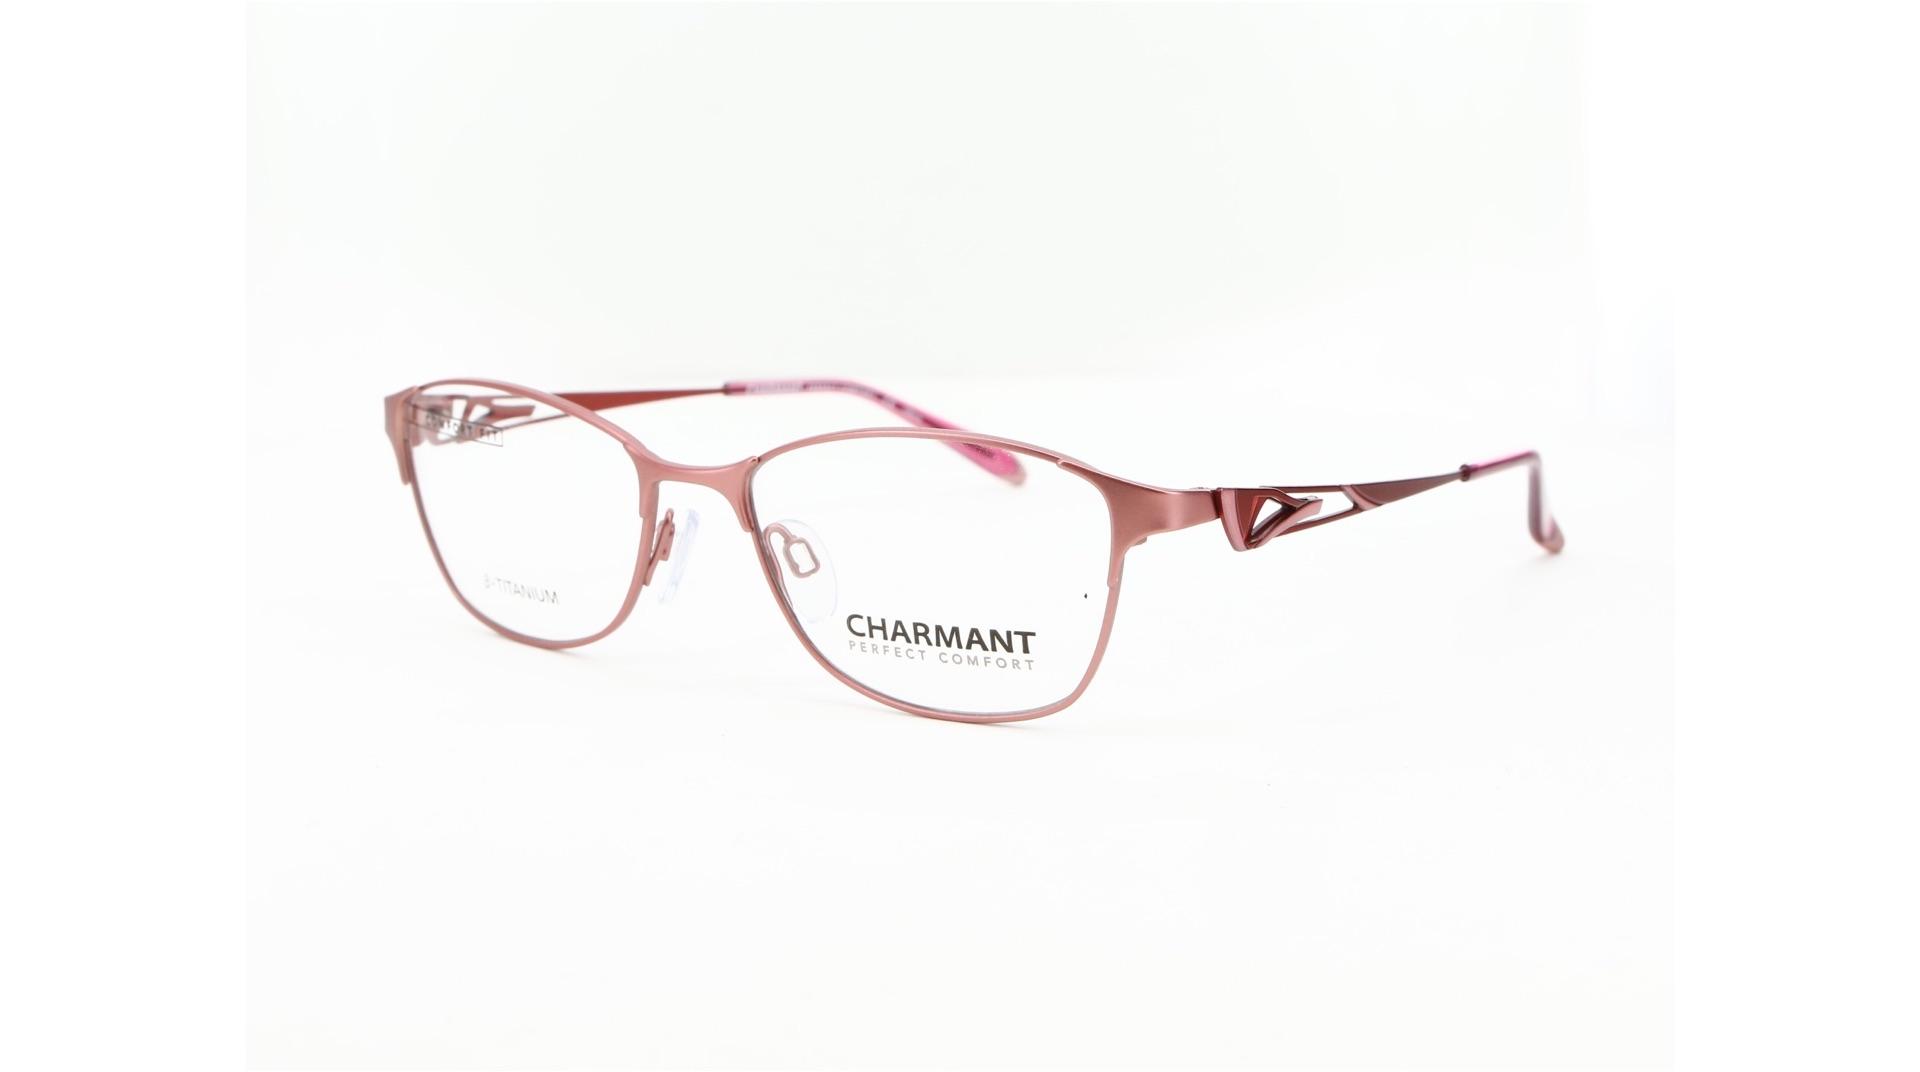 Charmant - ref: 80458